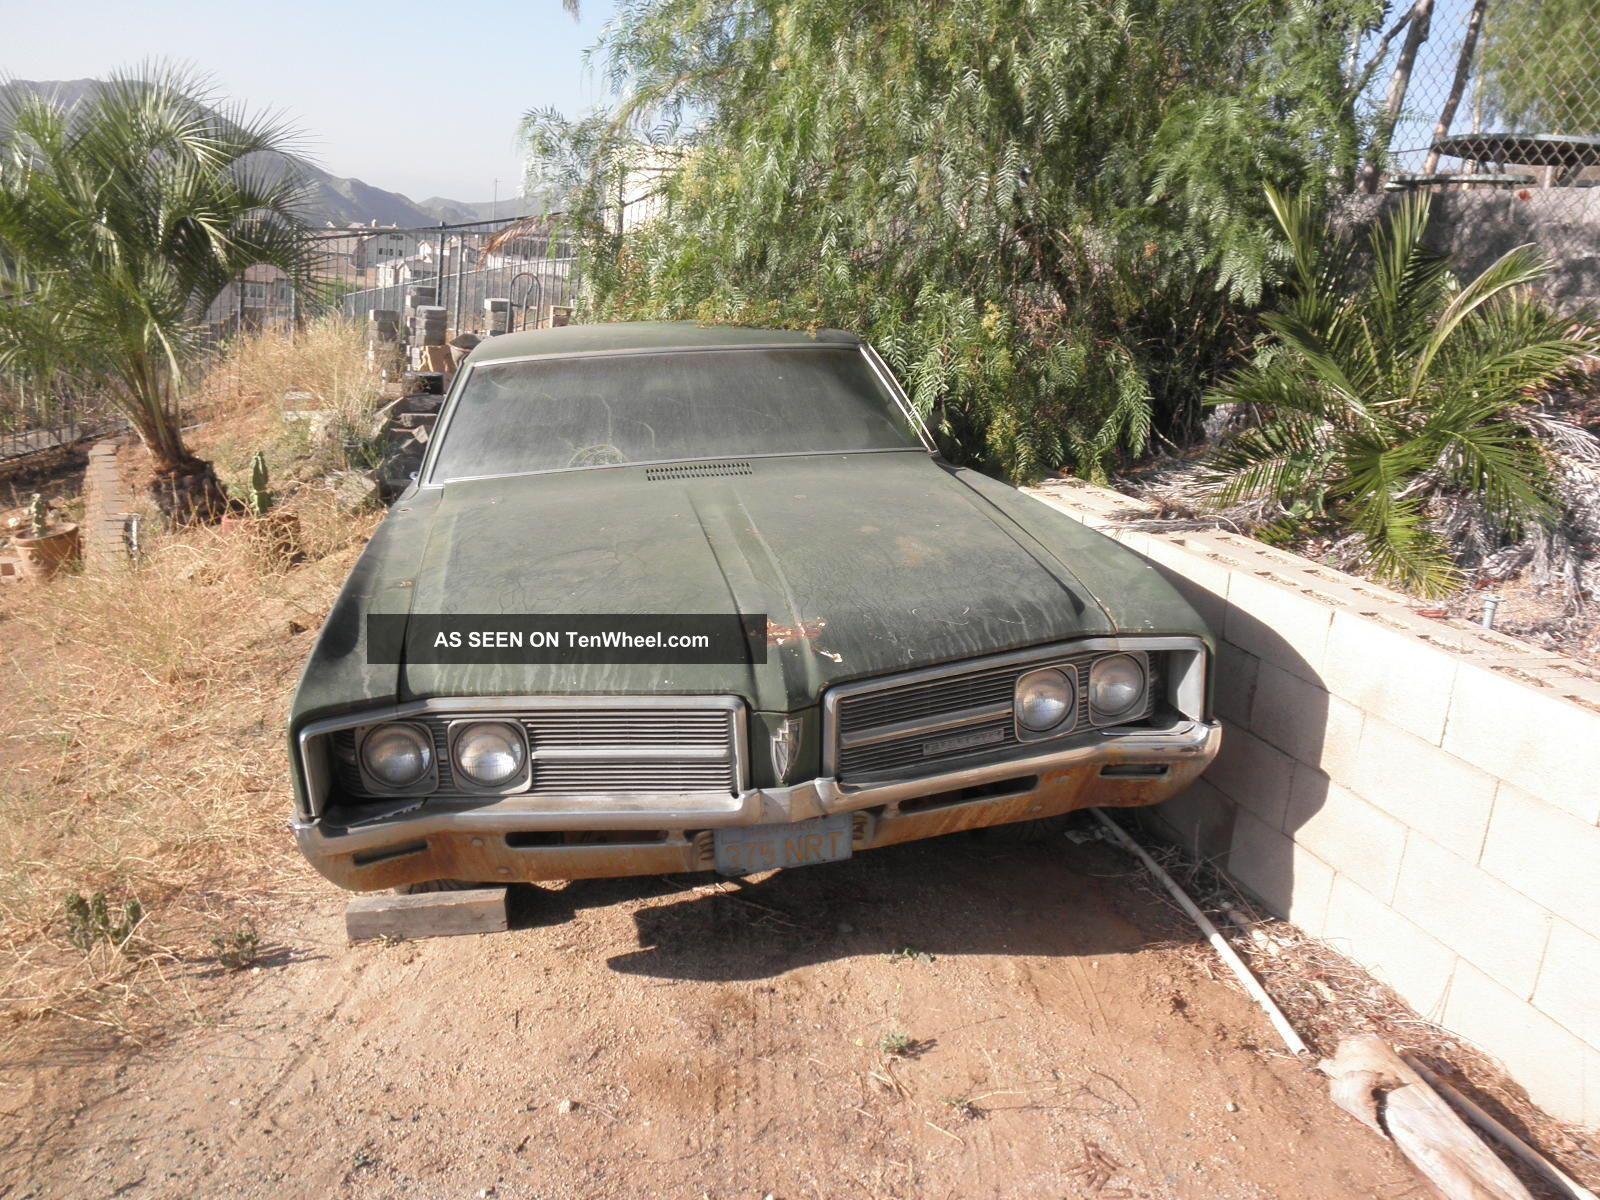 1968 Buick Lesabre 2 Door Coupe Needs Restro,  Good Start Rat Rod Lowrider LeSabre photo